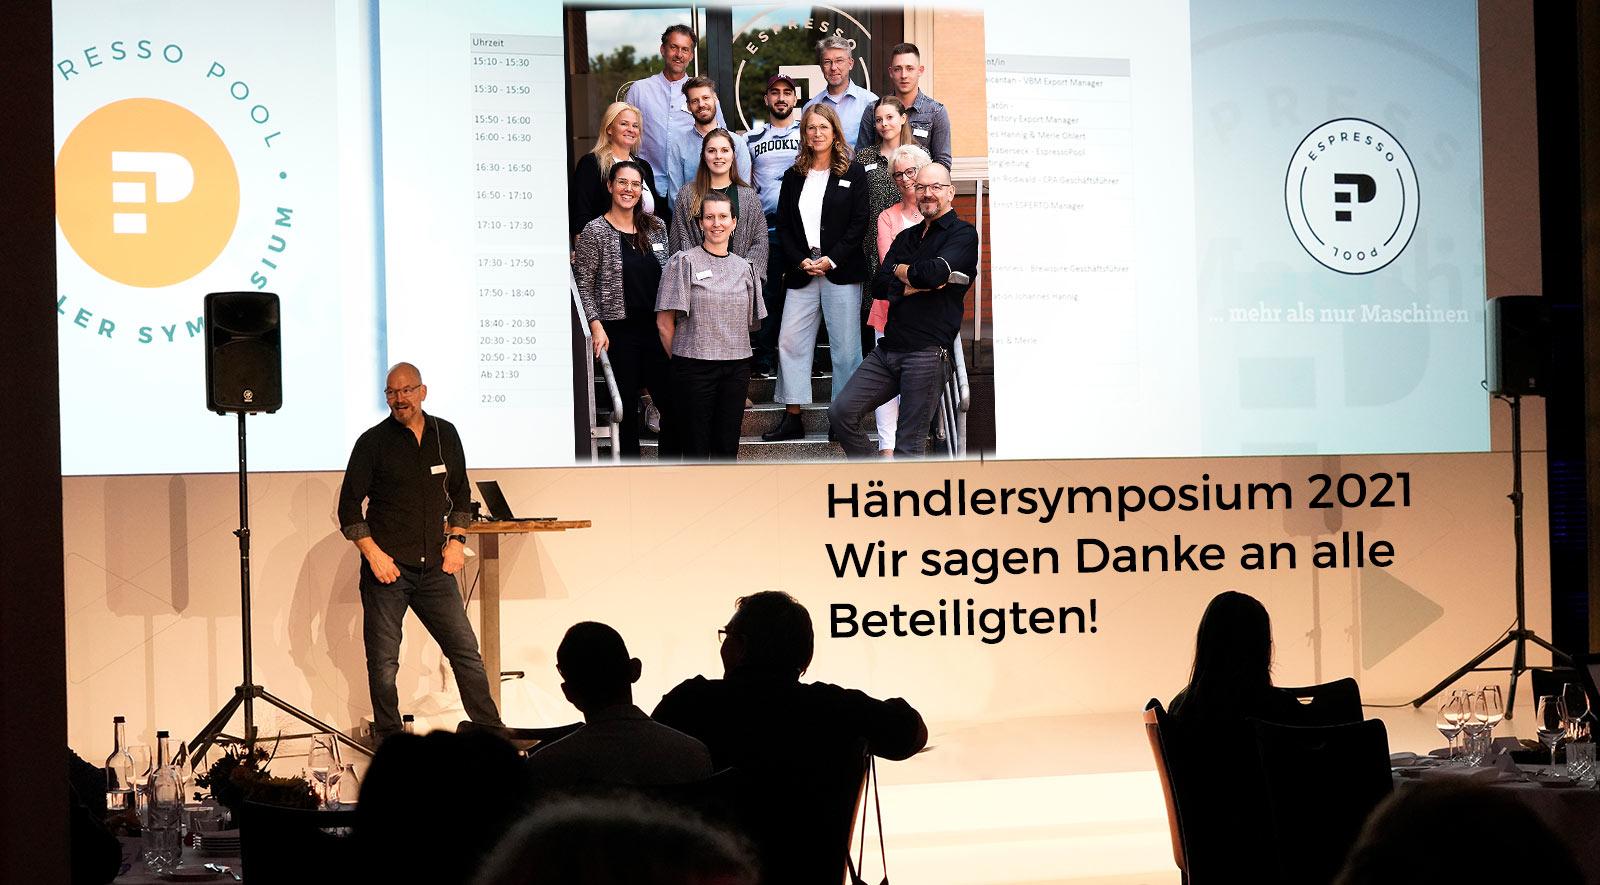 Espresso Partner Pool Händlersymposium 2021